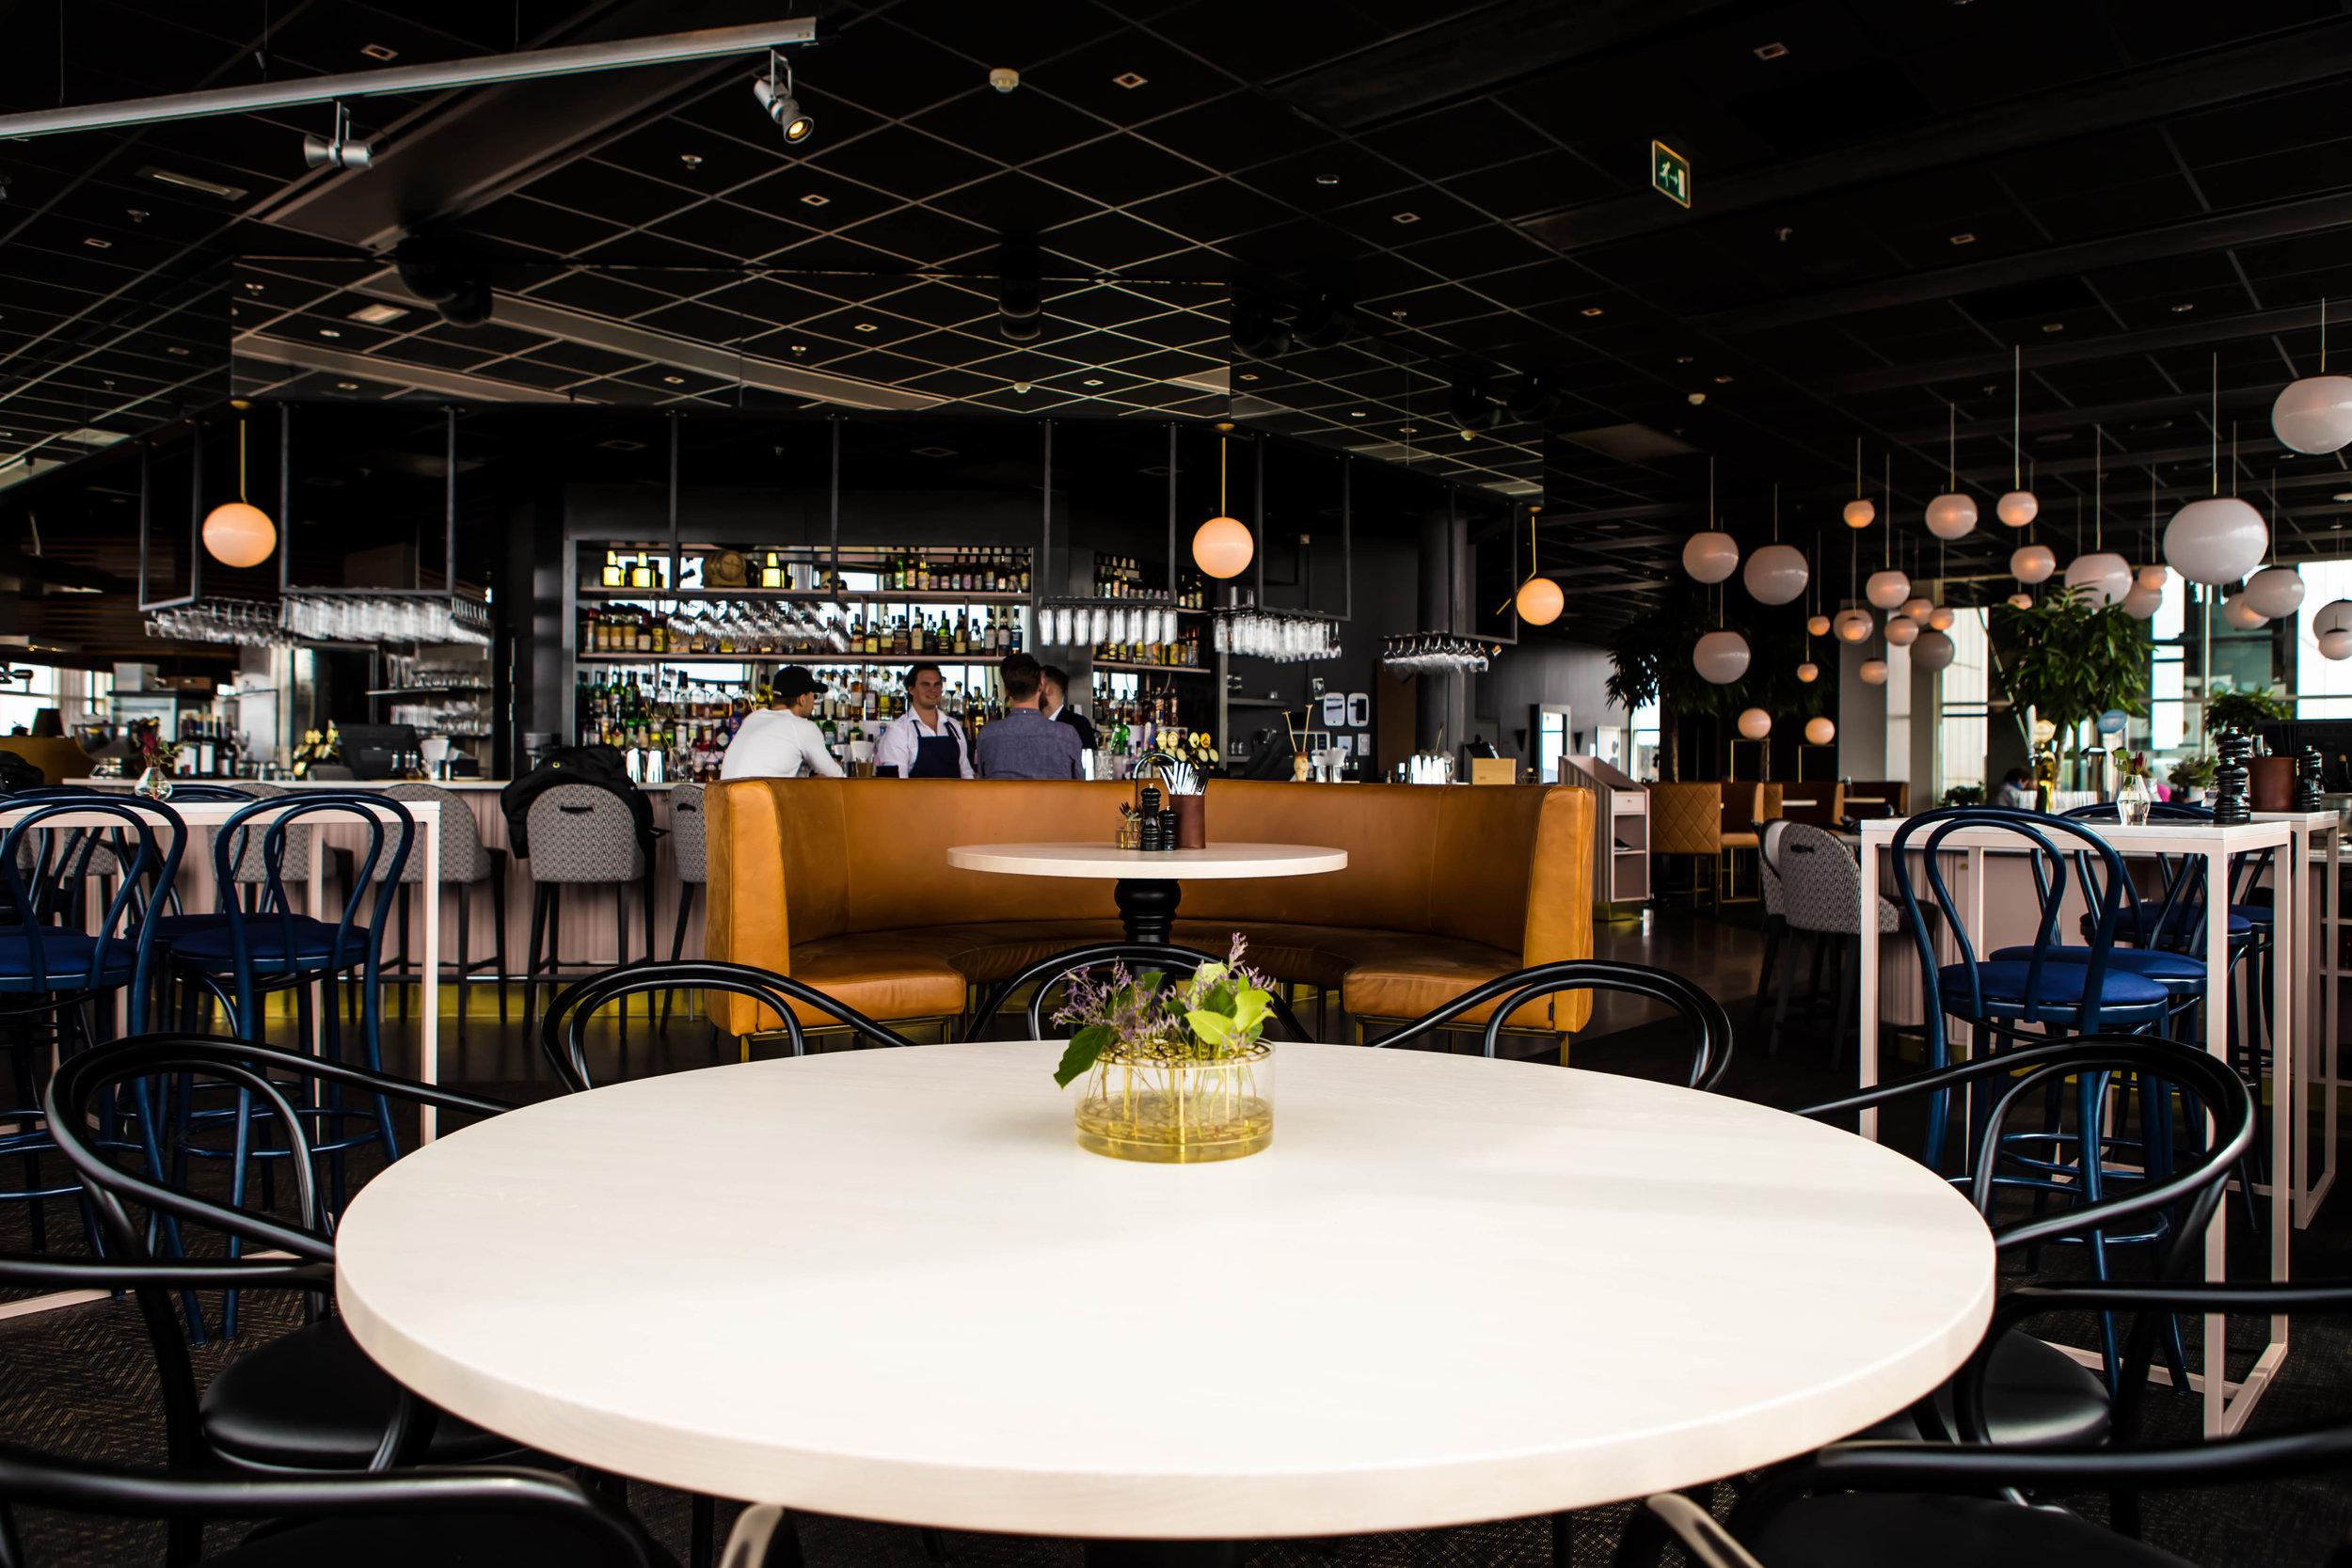 Sofa-restaurant-Heaven23-Gothenburg-Sweden-Facctory-photographer-Julio-Chang-6.jpg